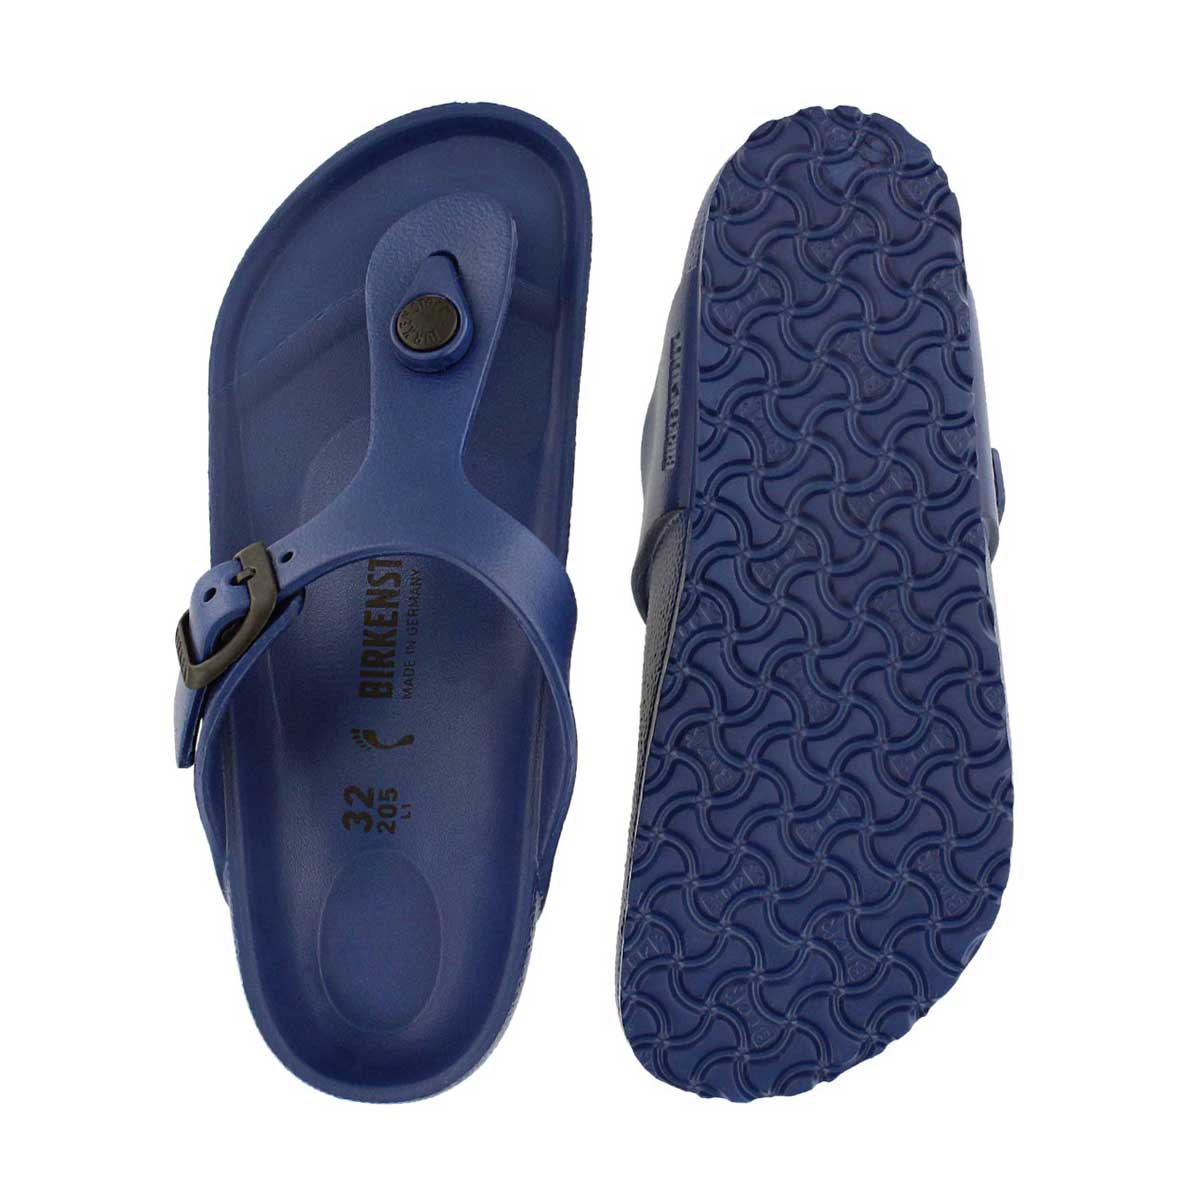 Grls Gizeh EVA navy thong sandal